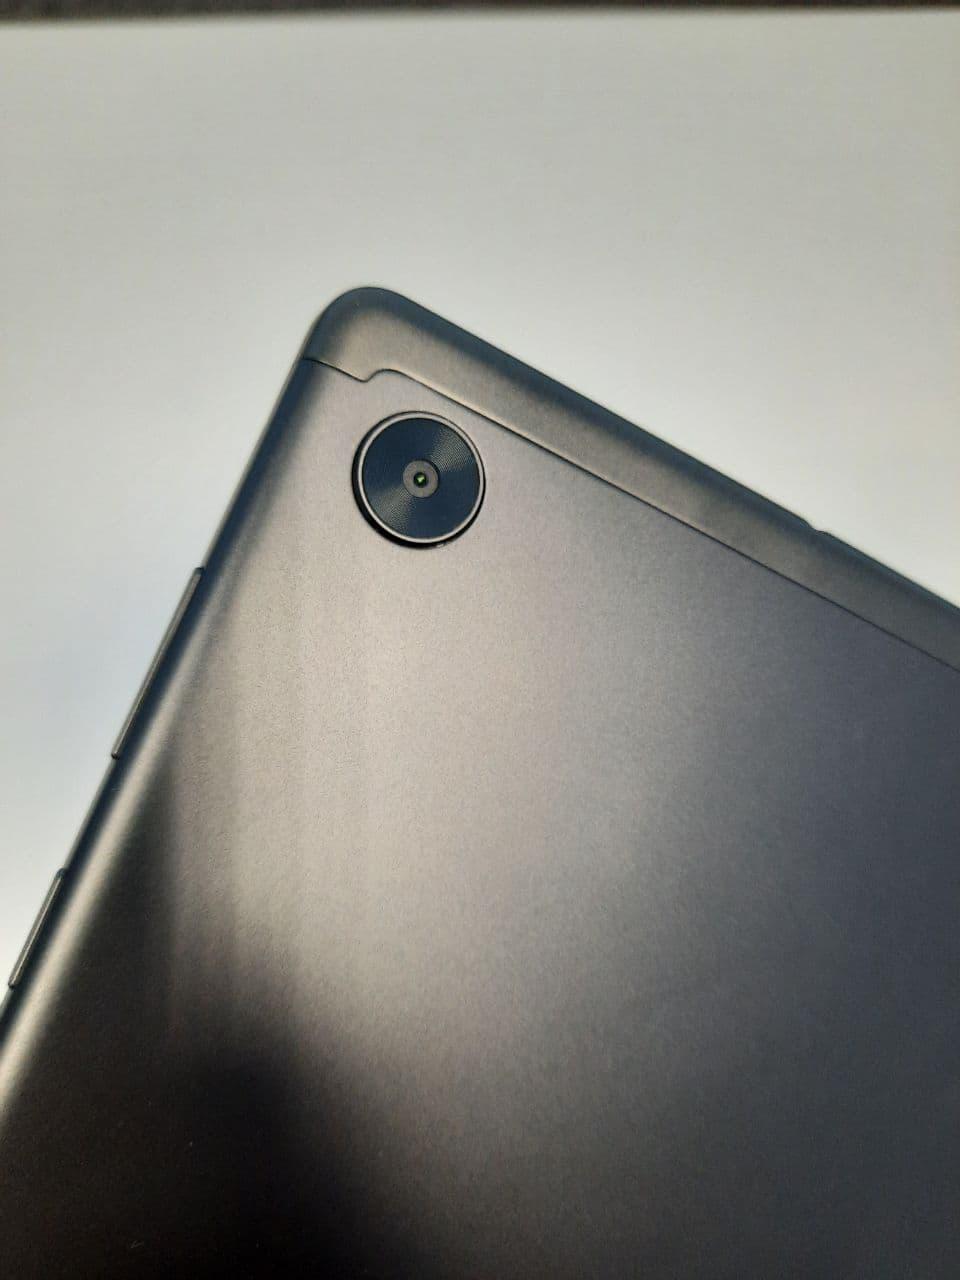 Нейтральний планшет для дому. Огляд девайсу Lenovo Tab M10 FHD Plus (2nd Gen)